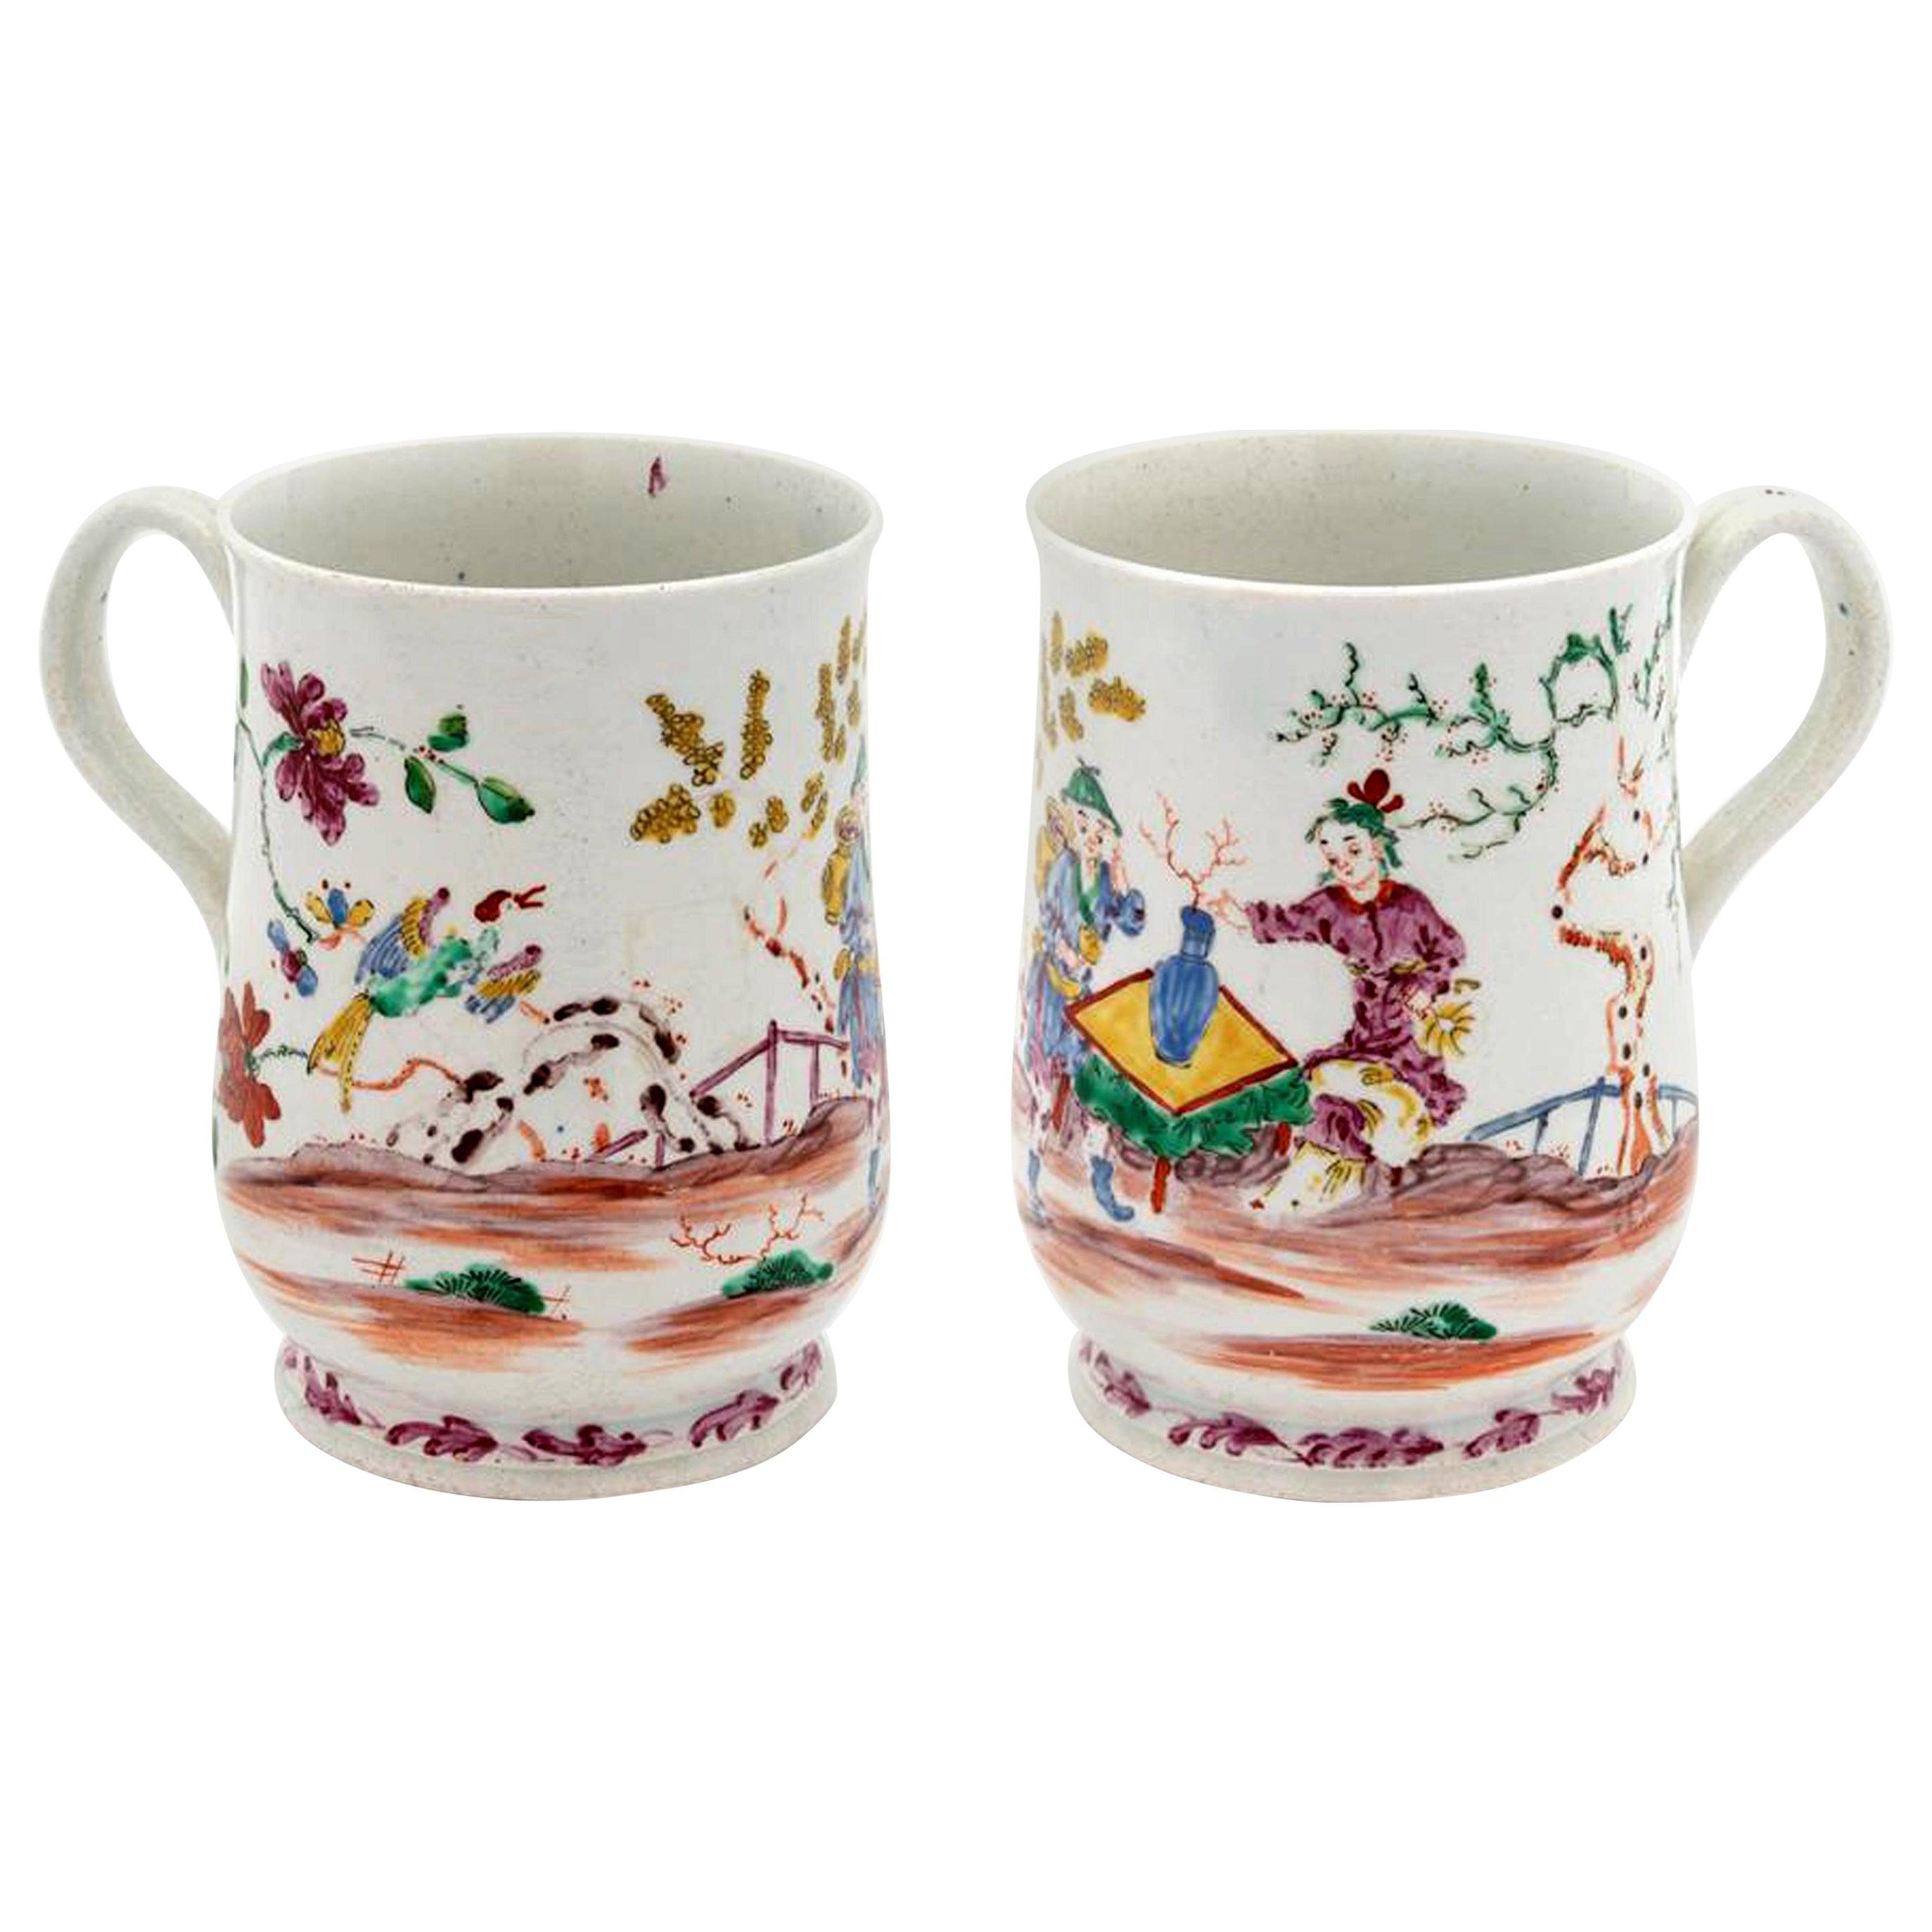 Bow Porcelain Chinoiserie Tankard, Bow, London, 1760-1765